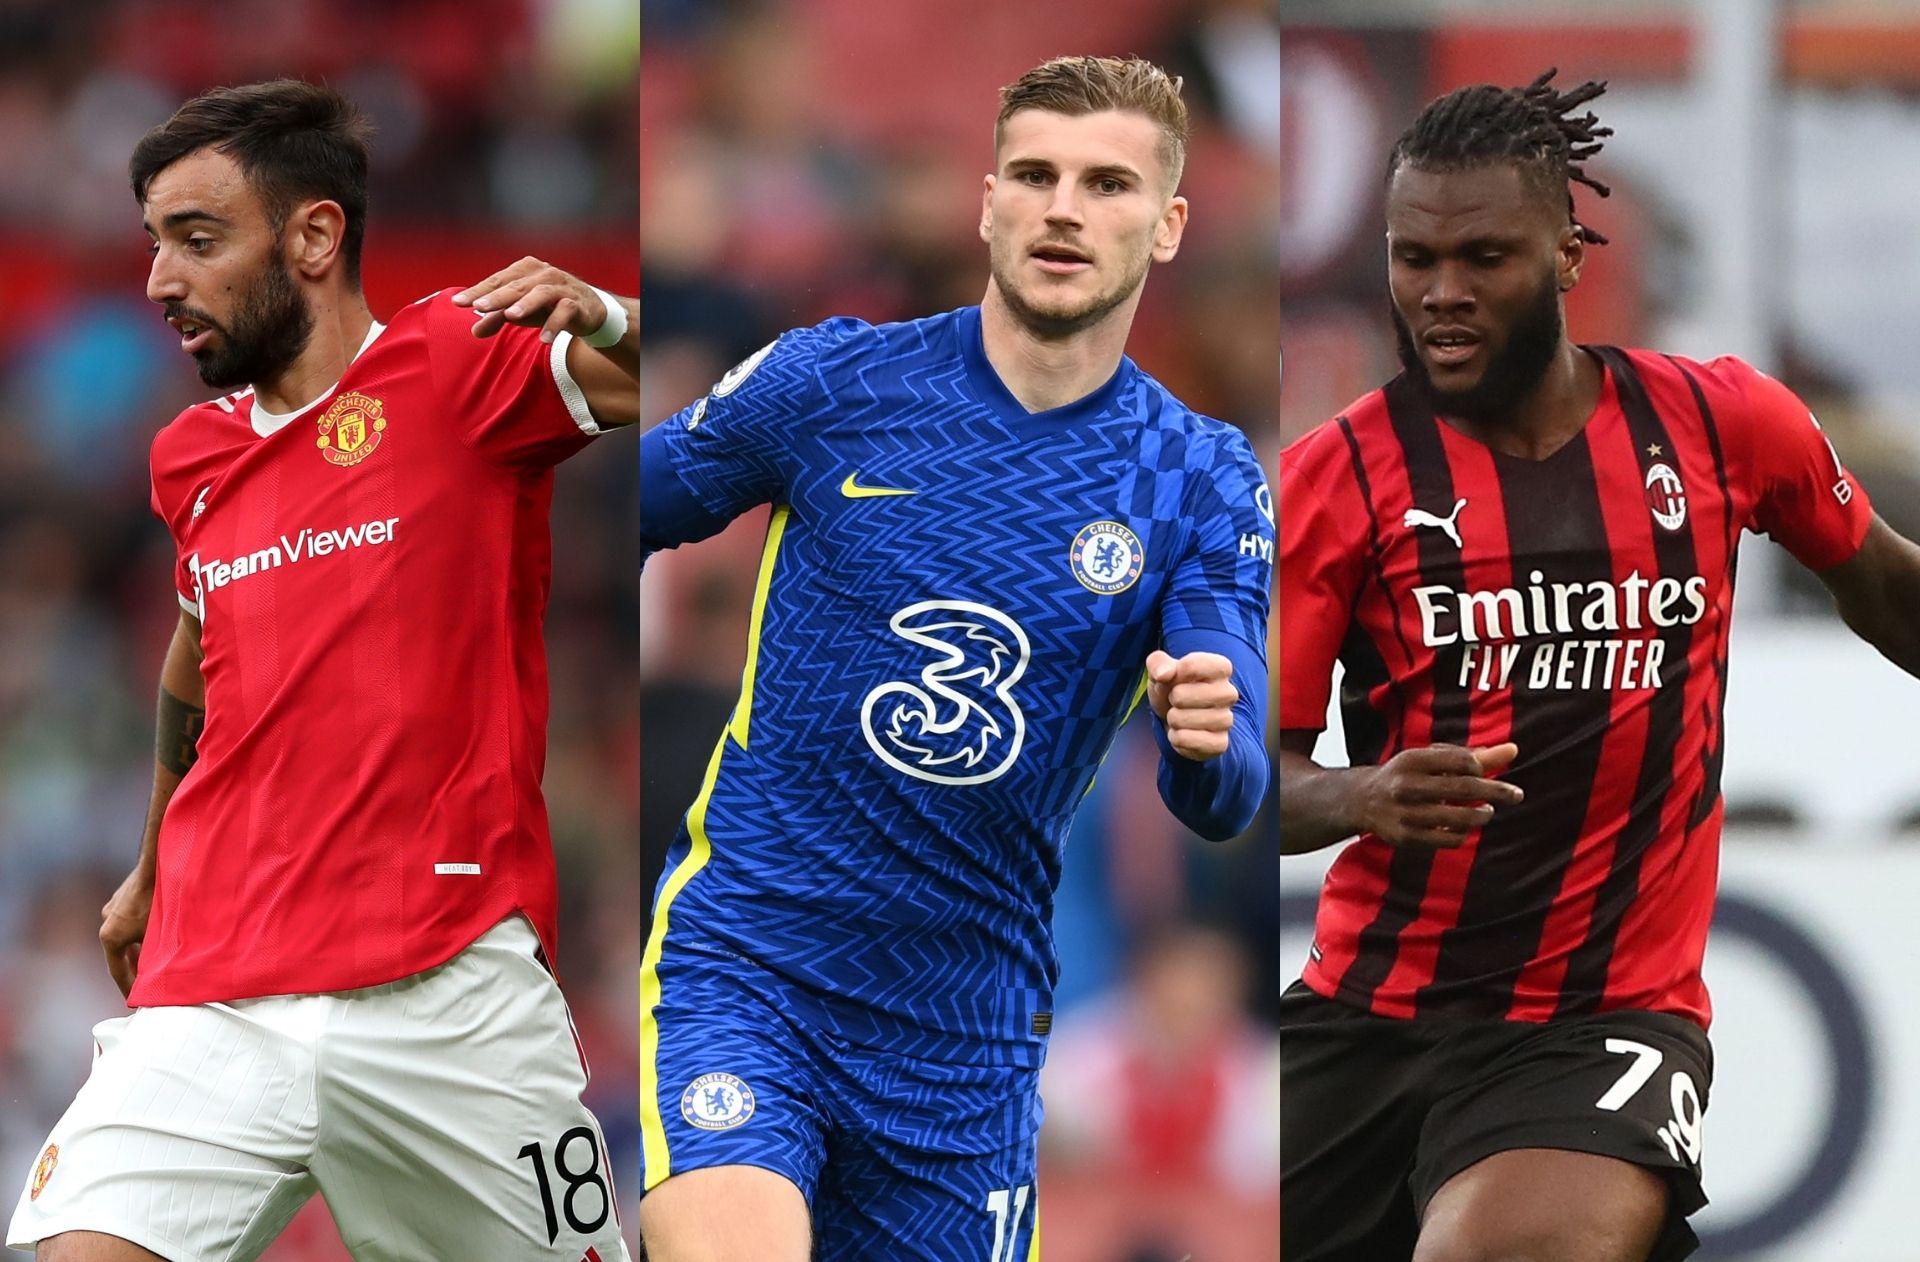 Bruno Fernandes Man United, Timo Werner - Chelsea, Franck Kessie - AC Milan